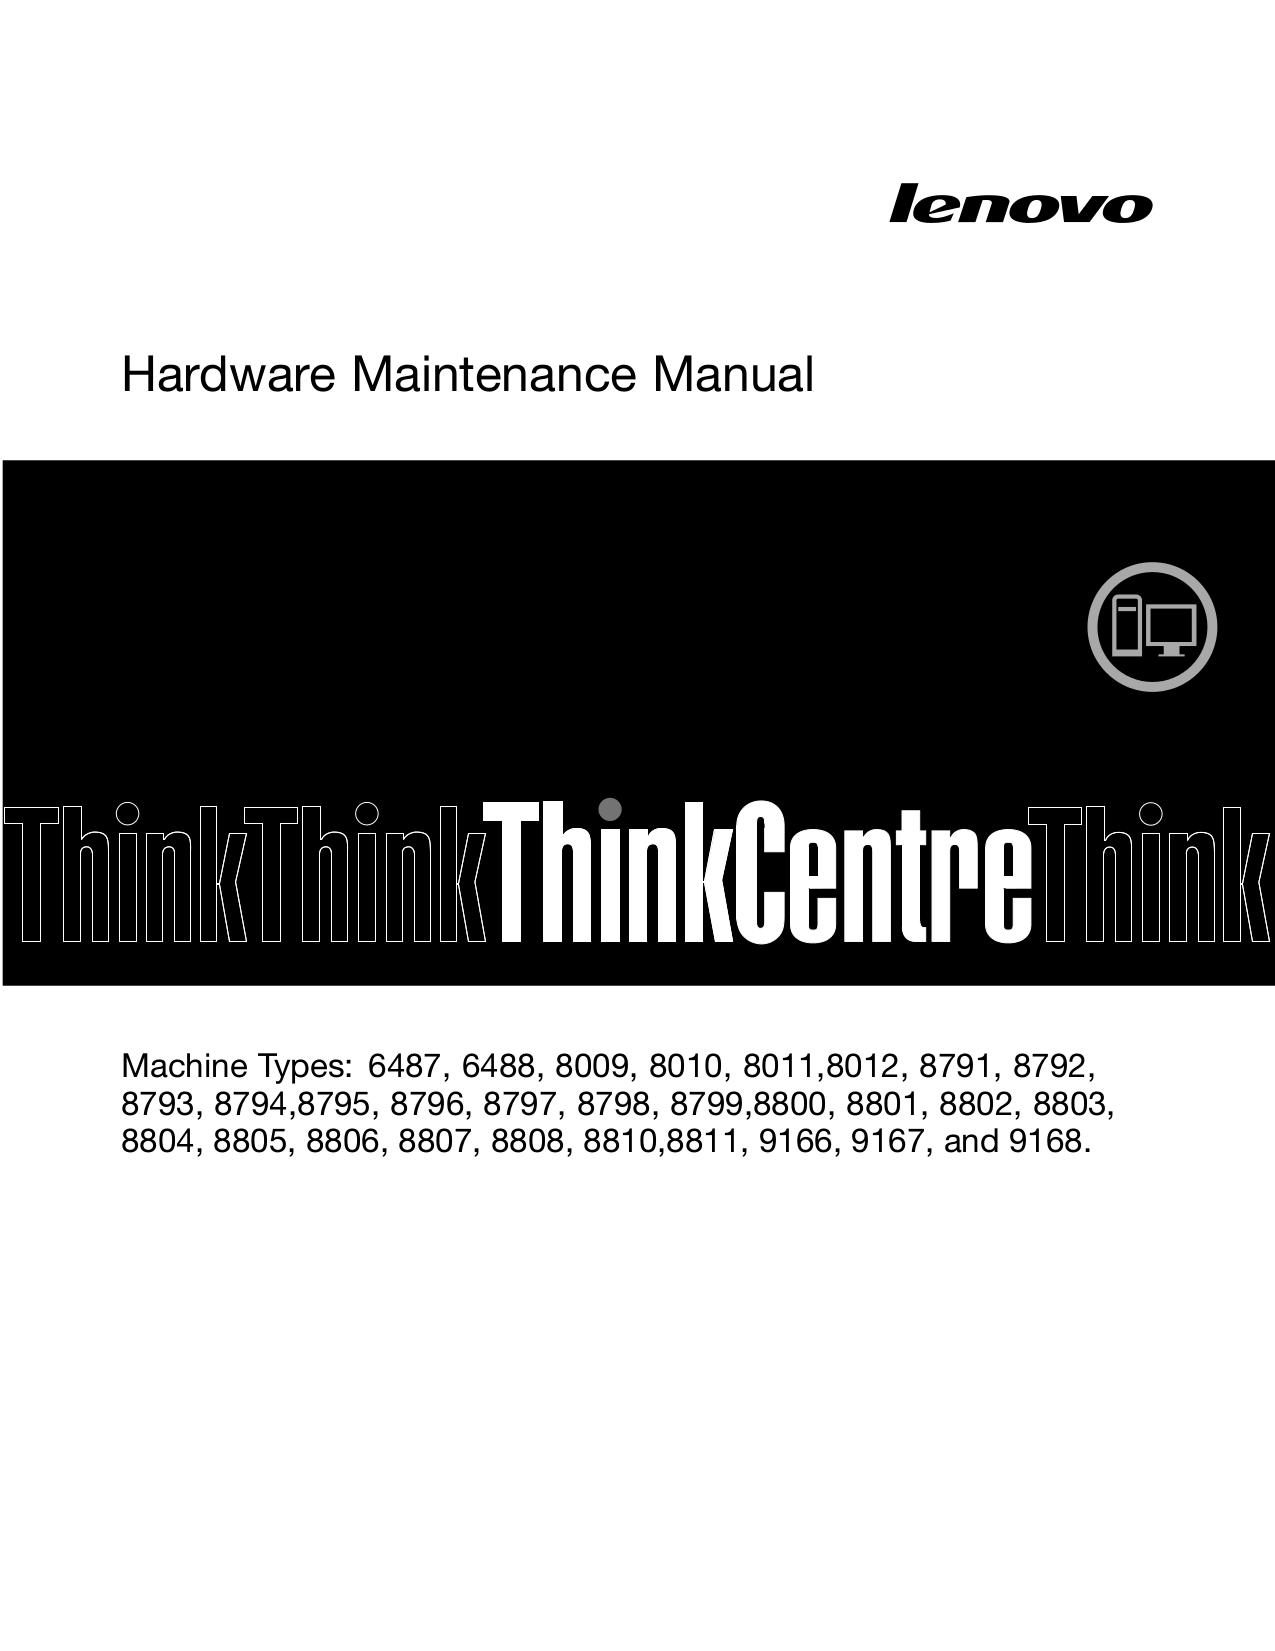 pdf for Lenovo Desktop ThinkCentre M55 8805 manual